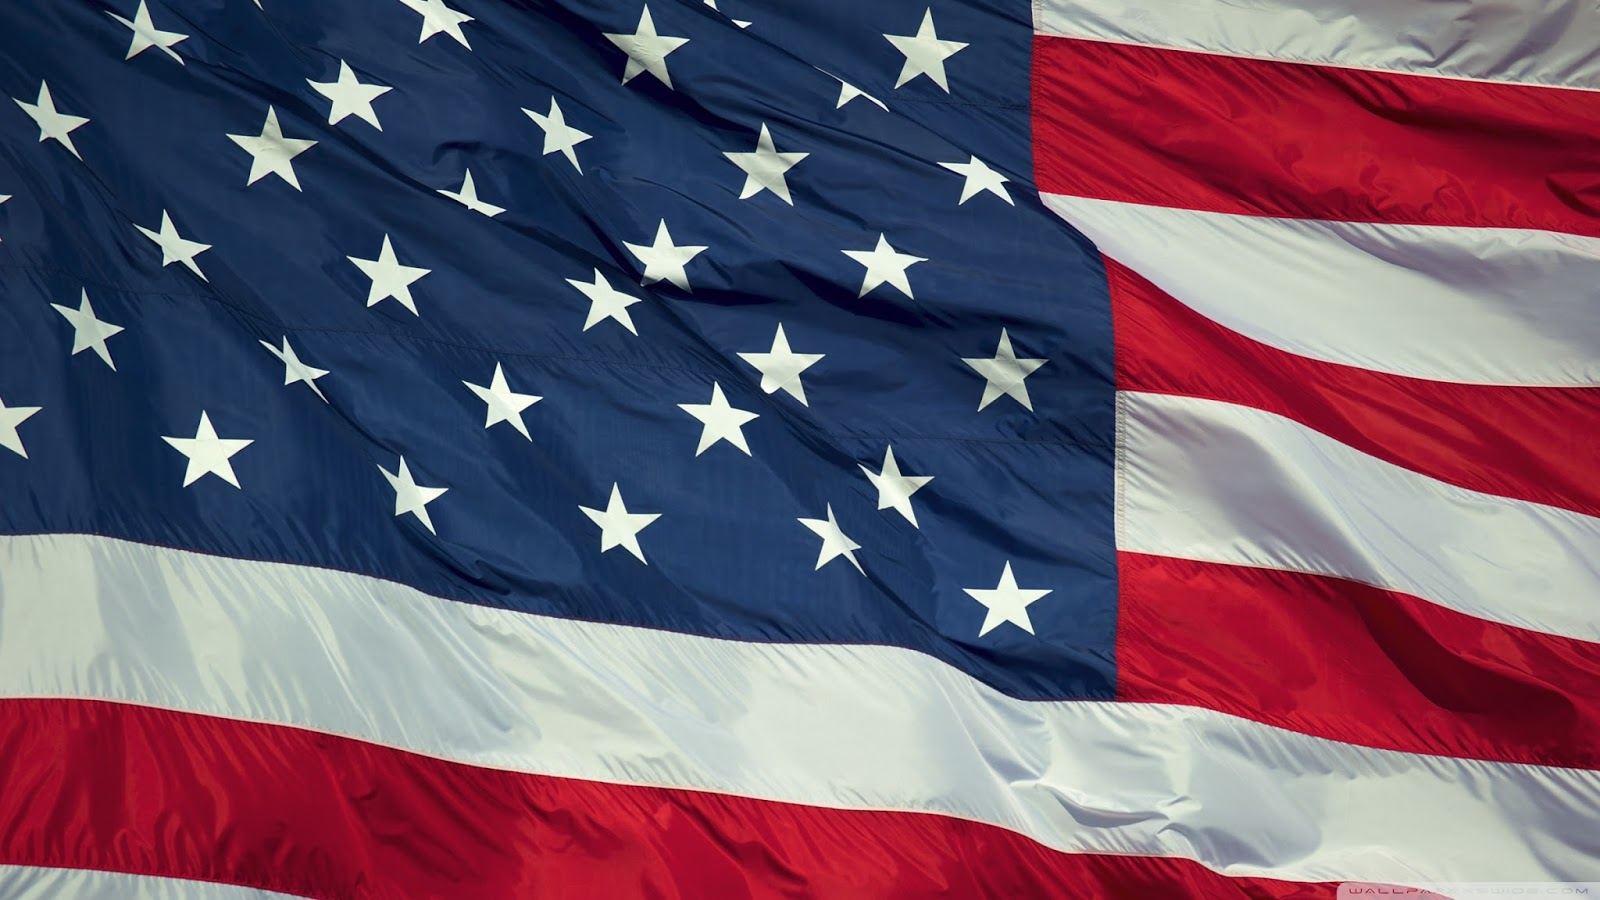 american_flag-wallpaper-2400x1350